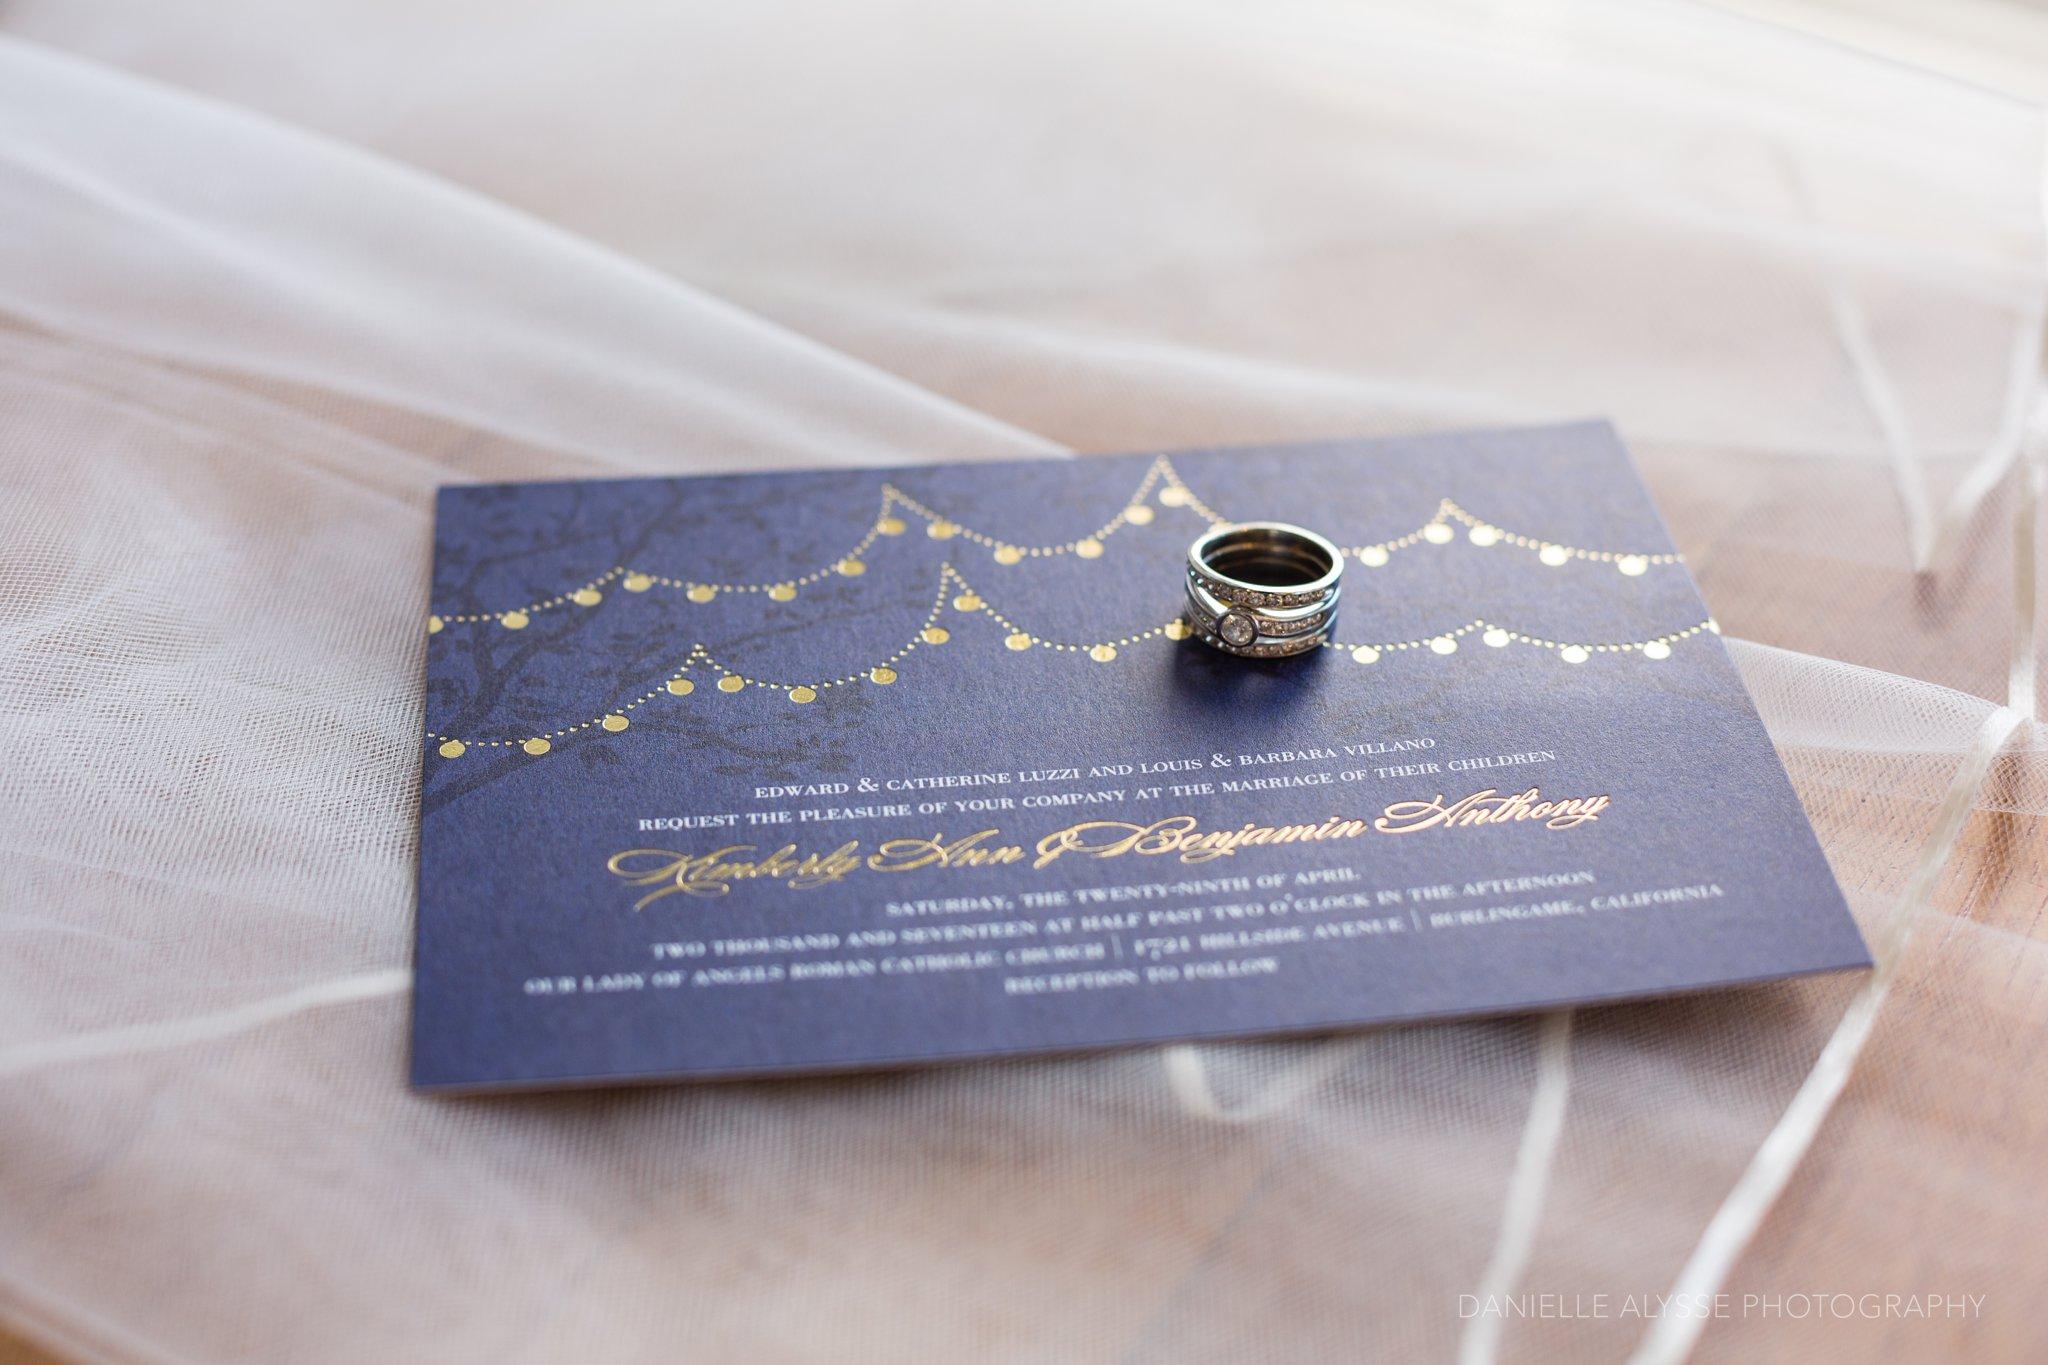 170429_blog_kimberly_ben_wedding_san_mateo_curiodyssey_danielle_alysse_photography_sacramento_photographer0008_WEB.jpg